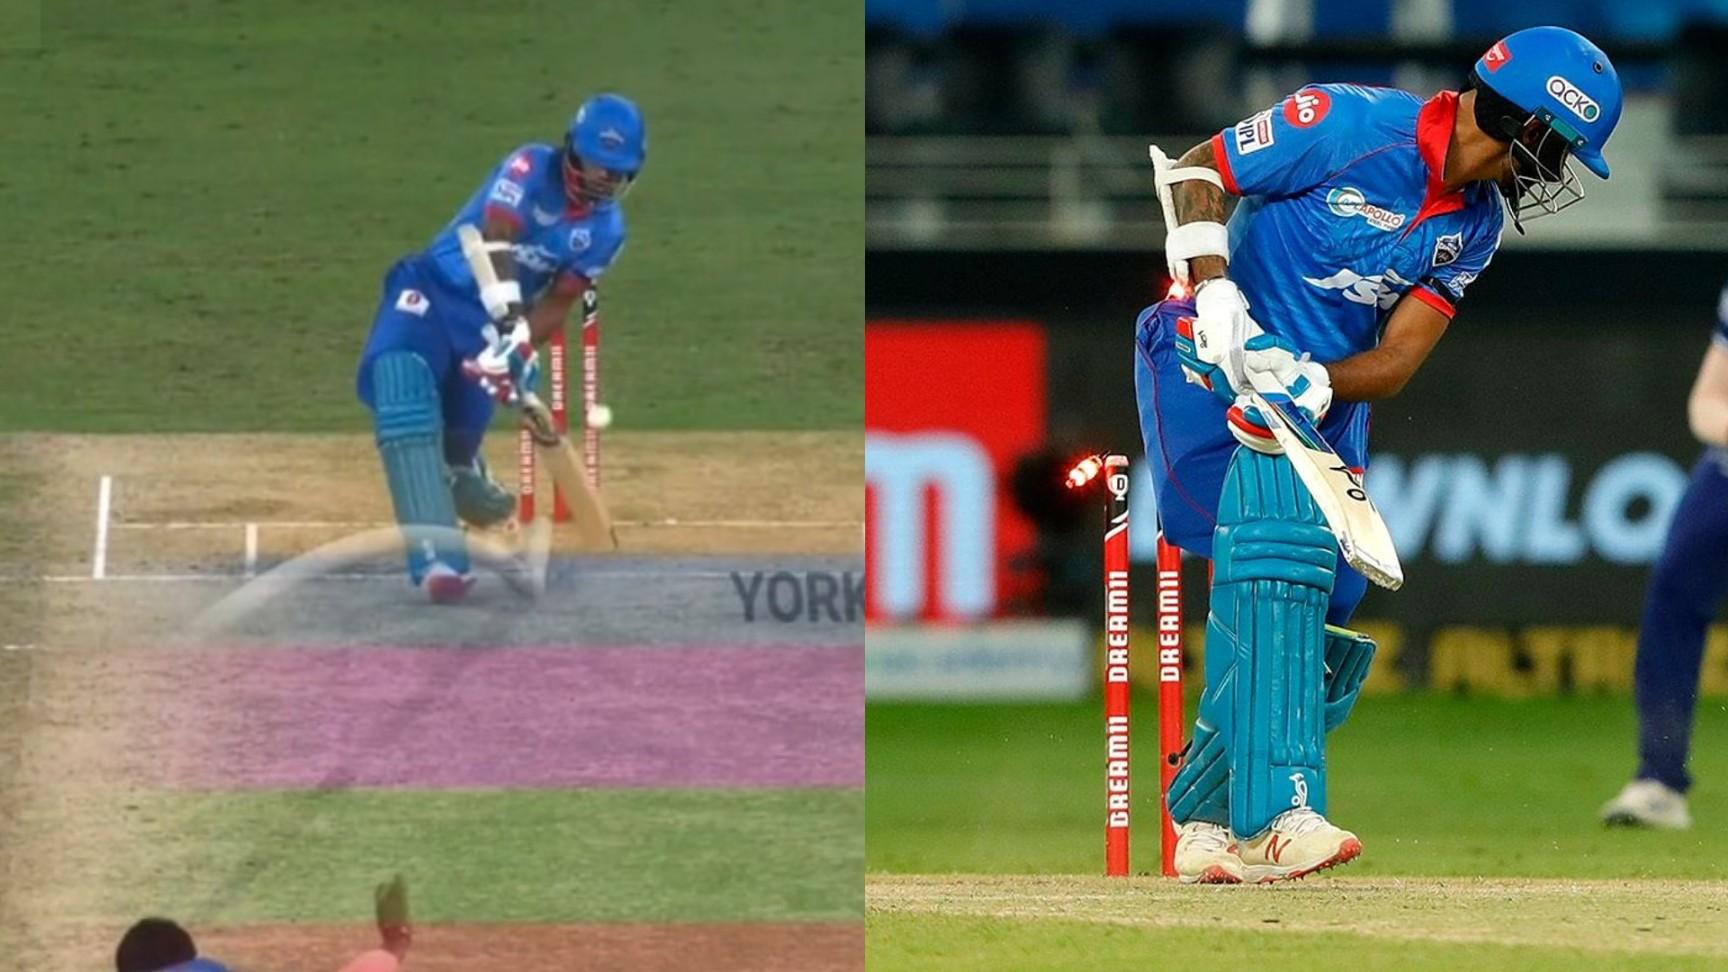 IPL 2020: WATCH- Jasprit Bumrah's amazing yorker sends Shikhar Dhawan back for duck